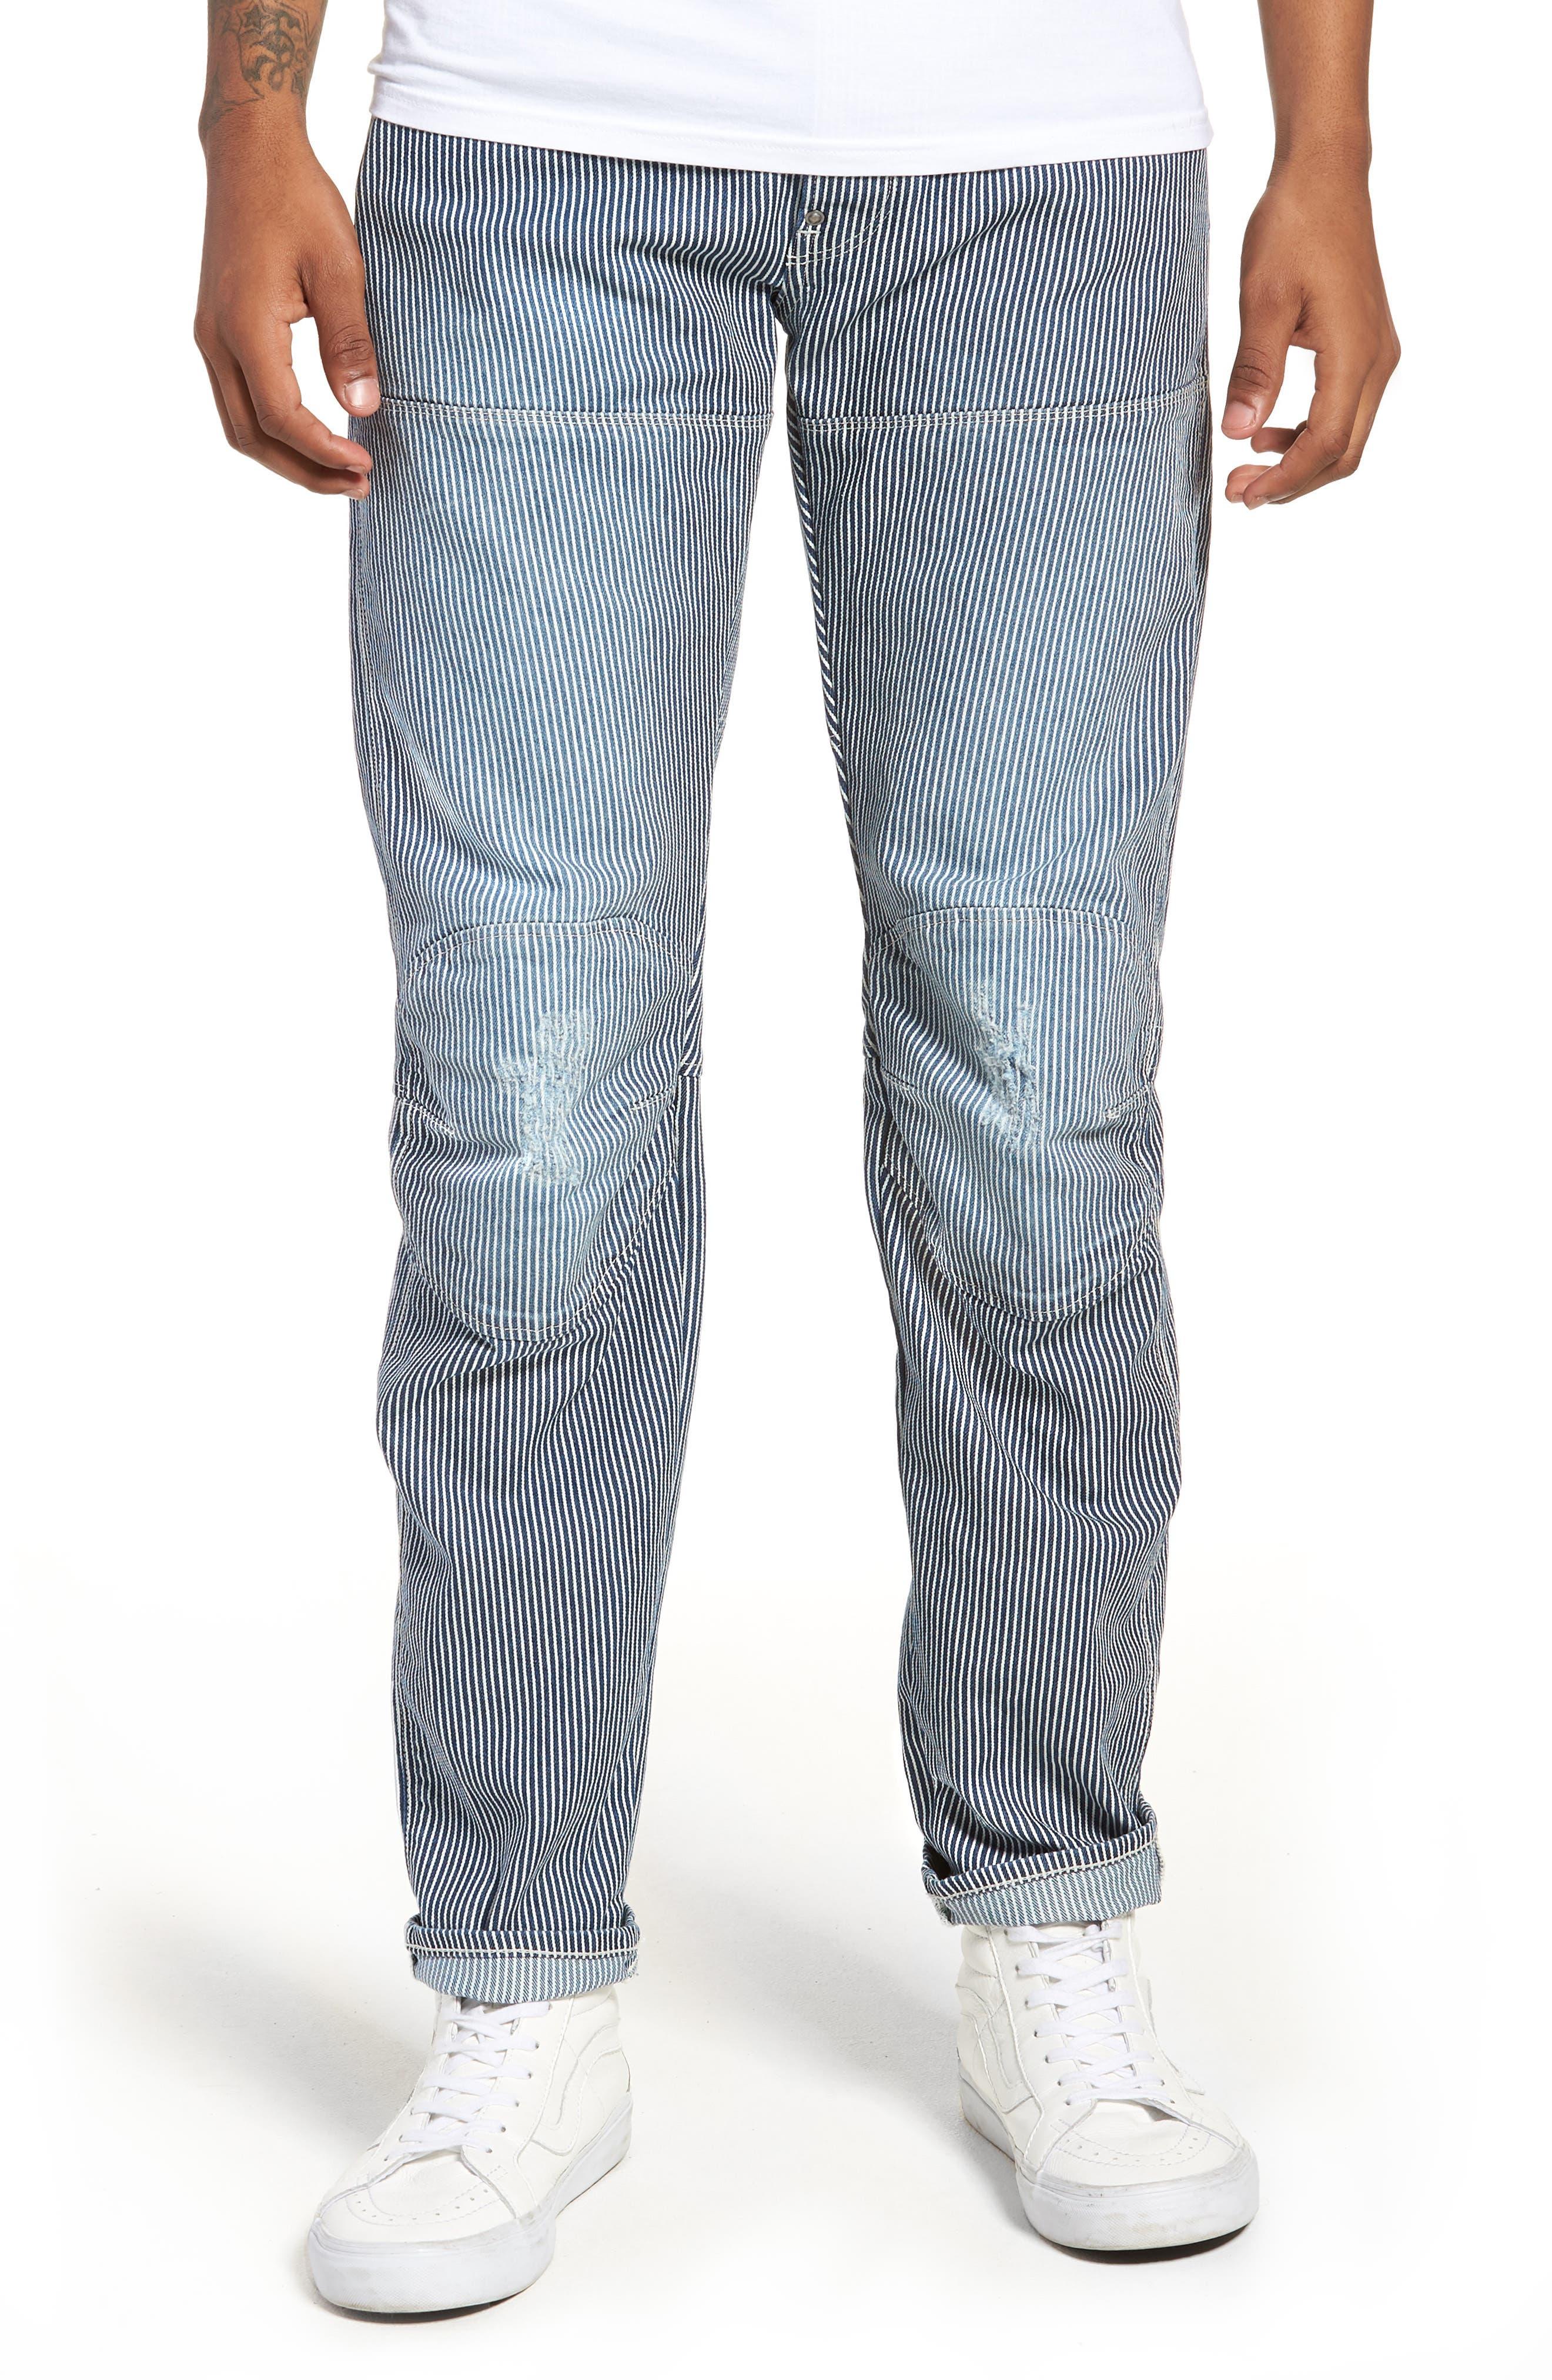 3D Slim Pants,                             Main thumbnail 1, color,                             420